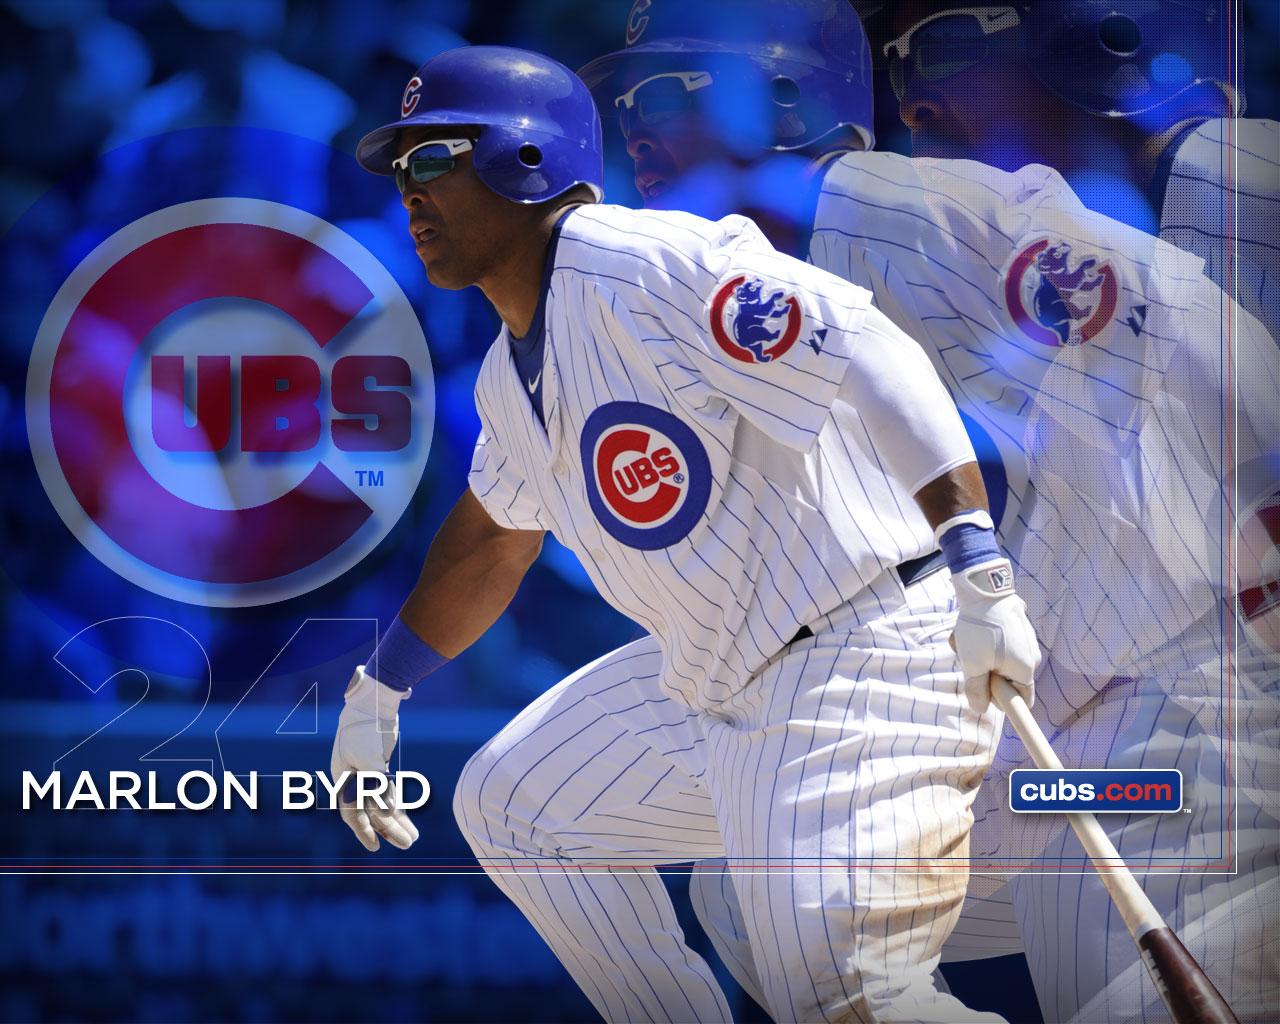 Cubs Wallpaper for your Desktop Chicago Cubs 1280x1024